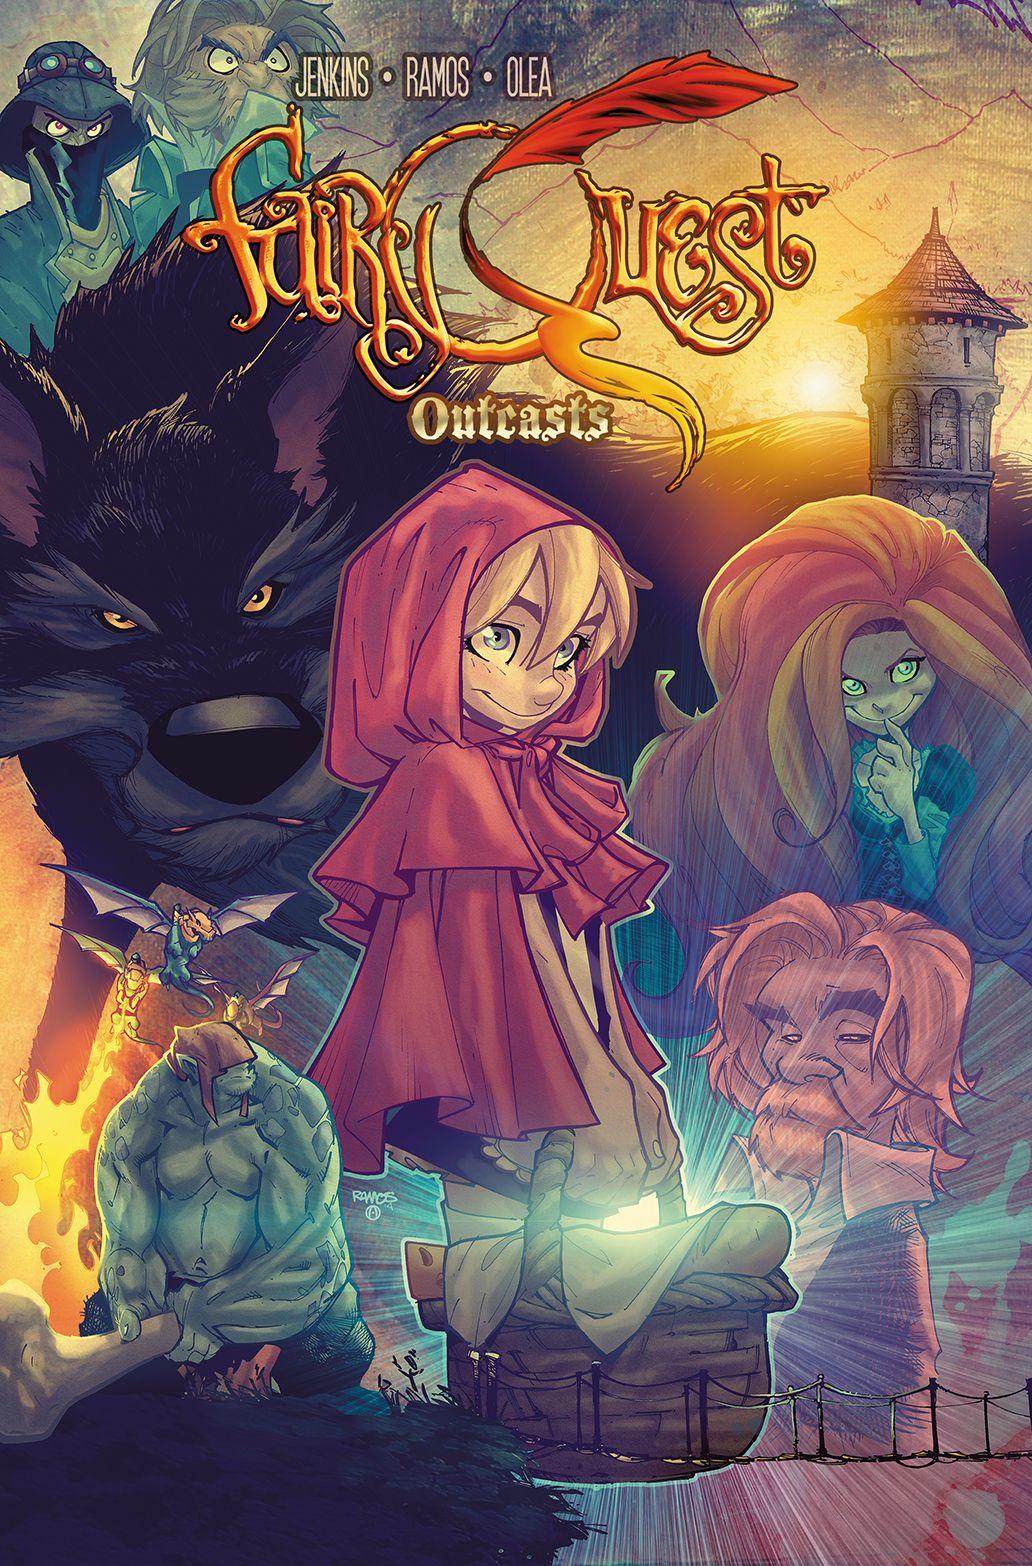 Fairy Quest Outcasts Tpb Humberto Ramos Anime Marvel Comics